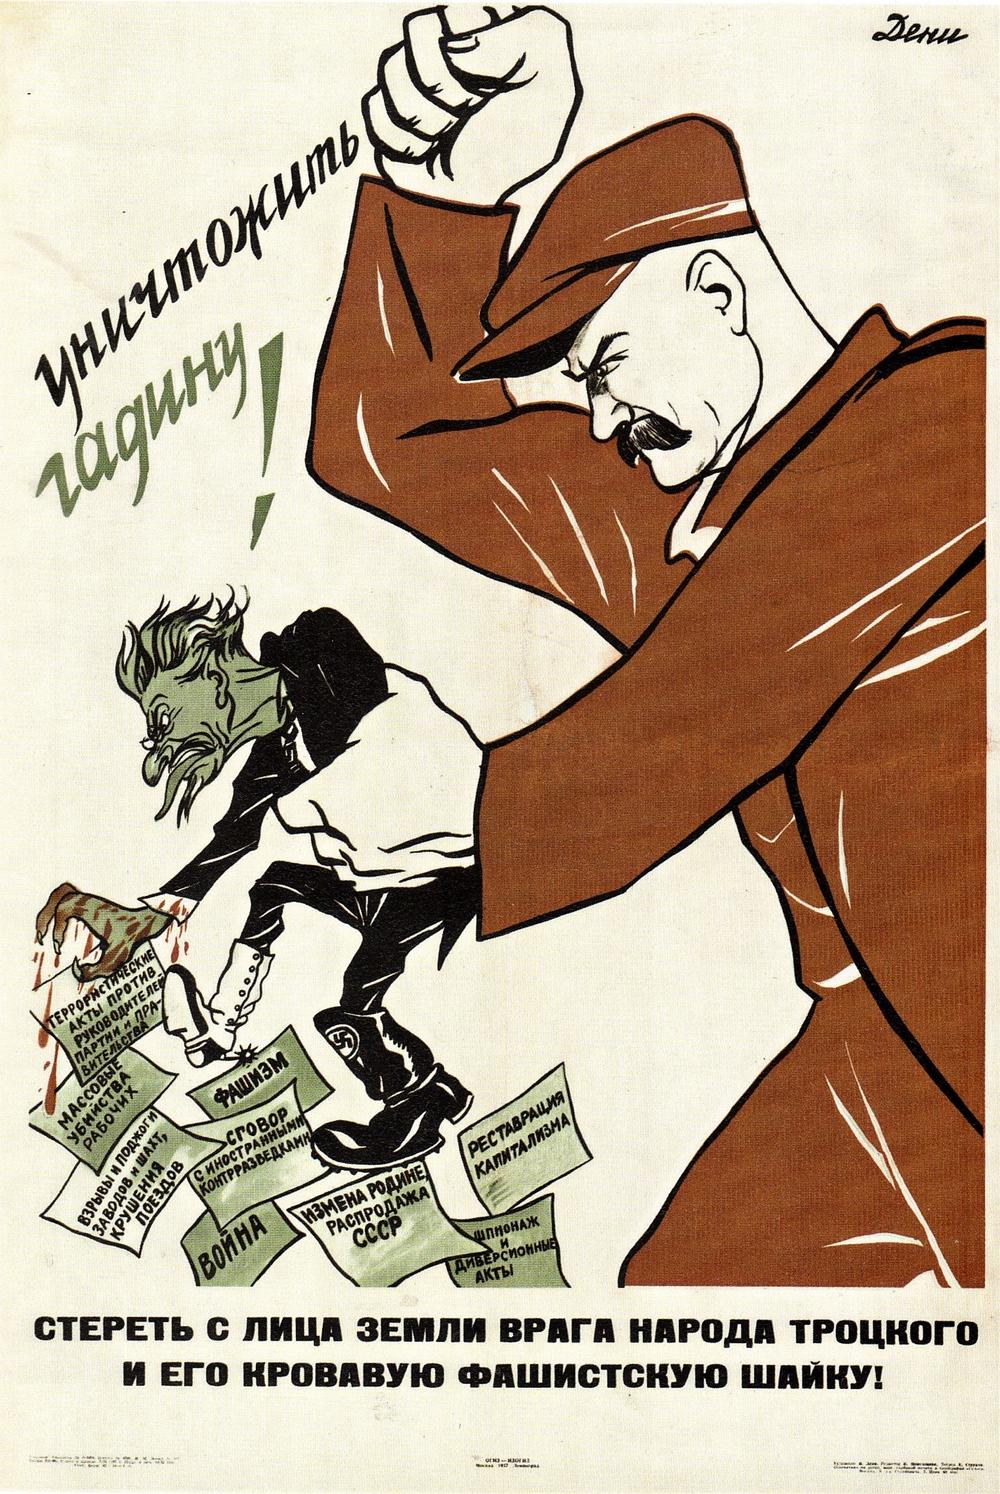 Viktor Deni, «Annéantissons la vermine», 1937